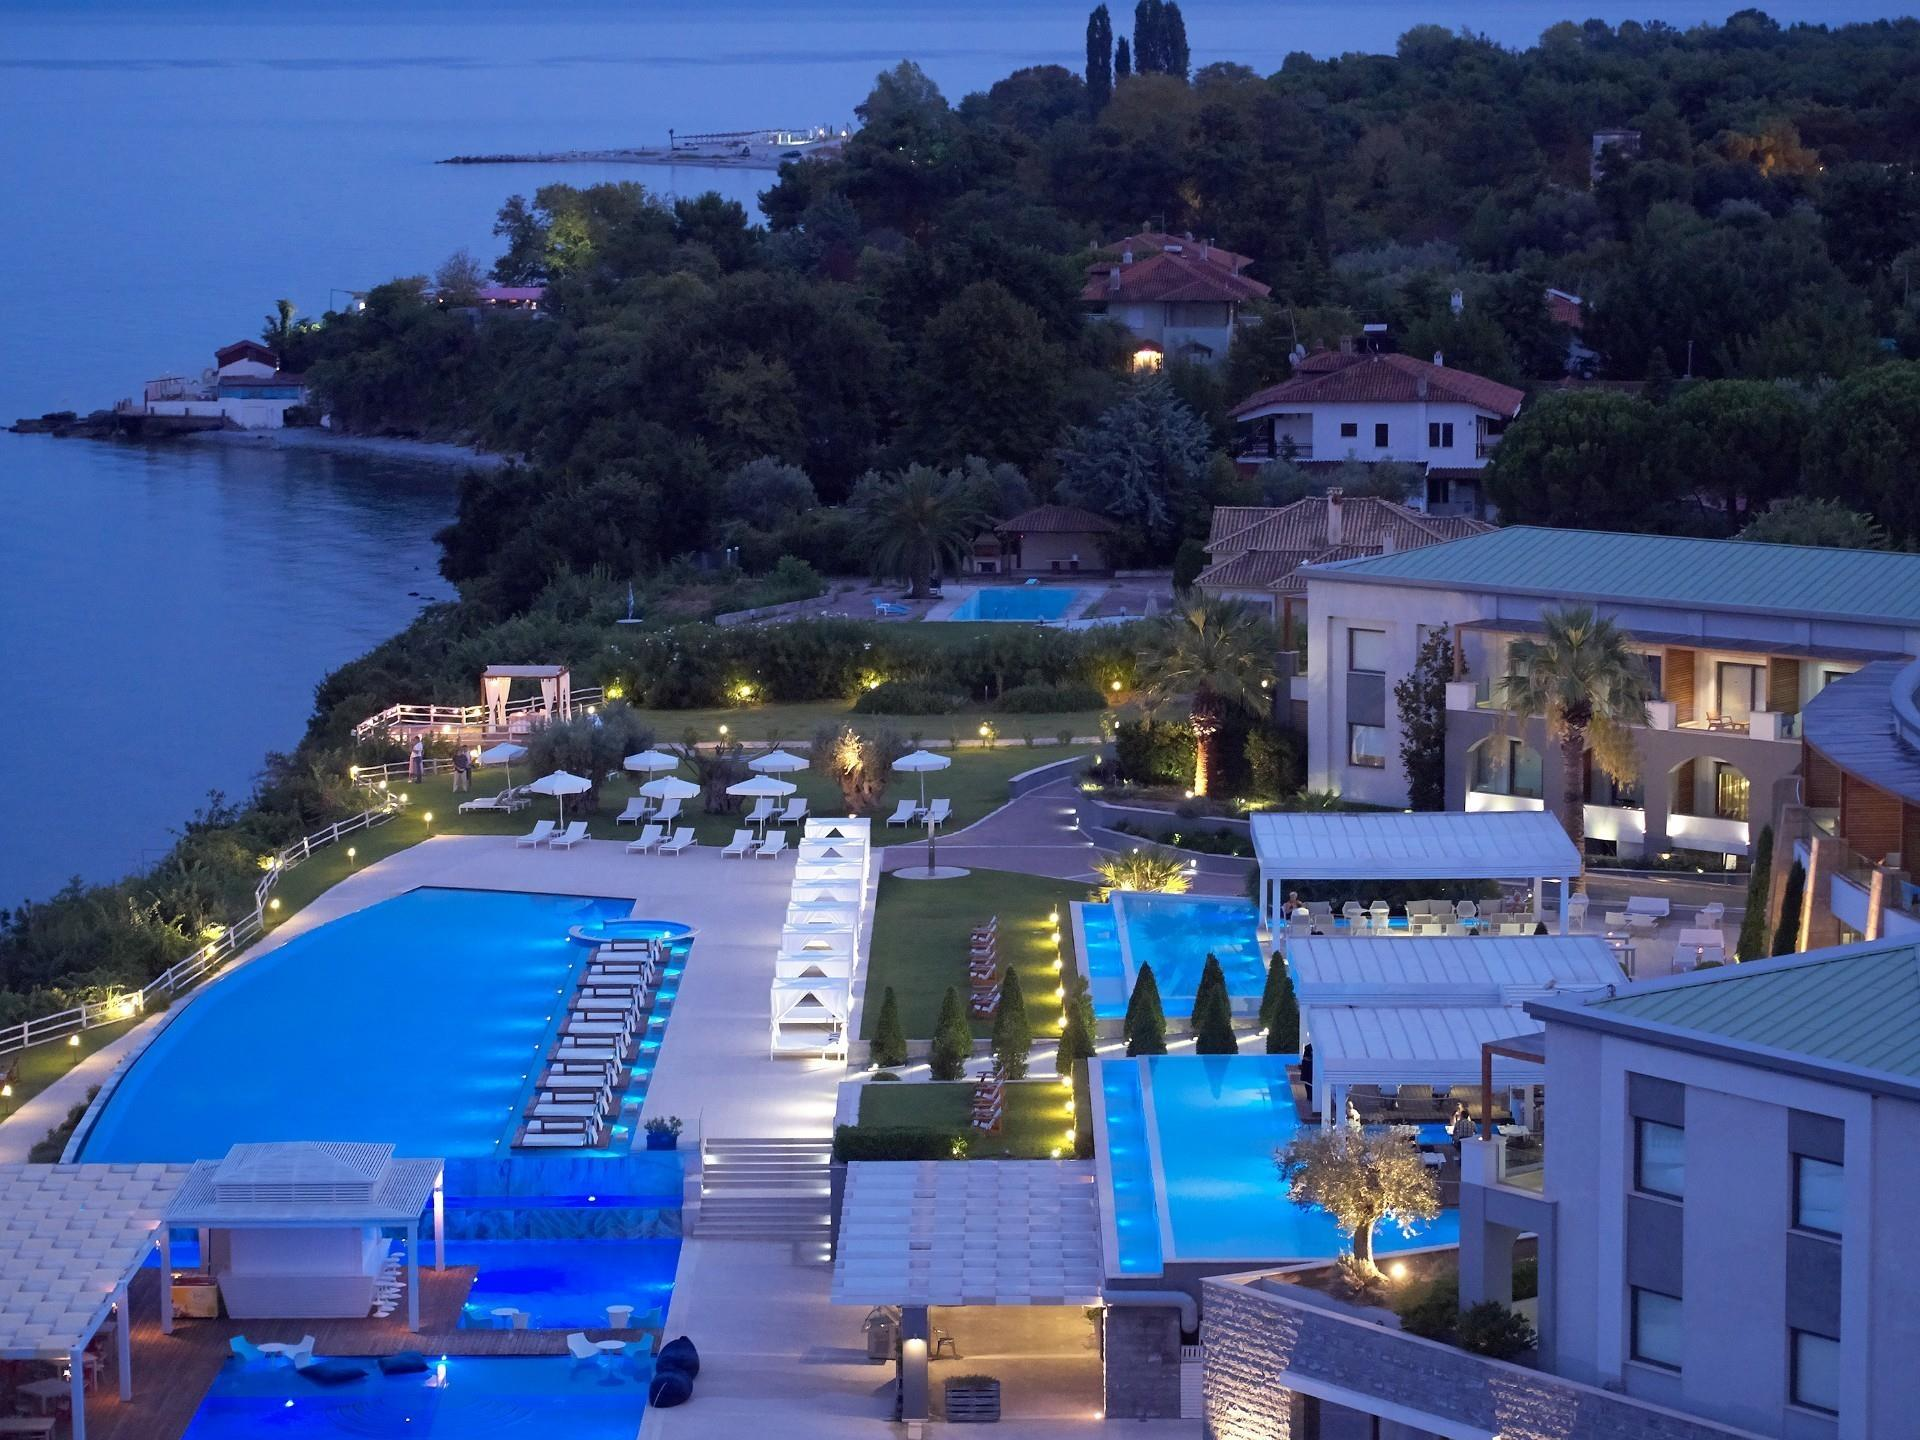 cavo-olympo-luxury-hotel-spa-genel-007